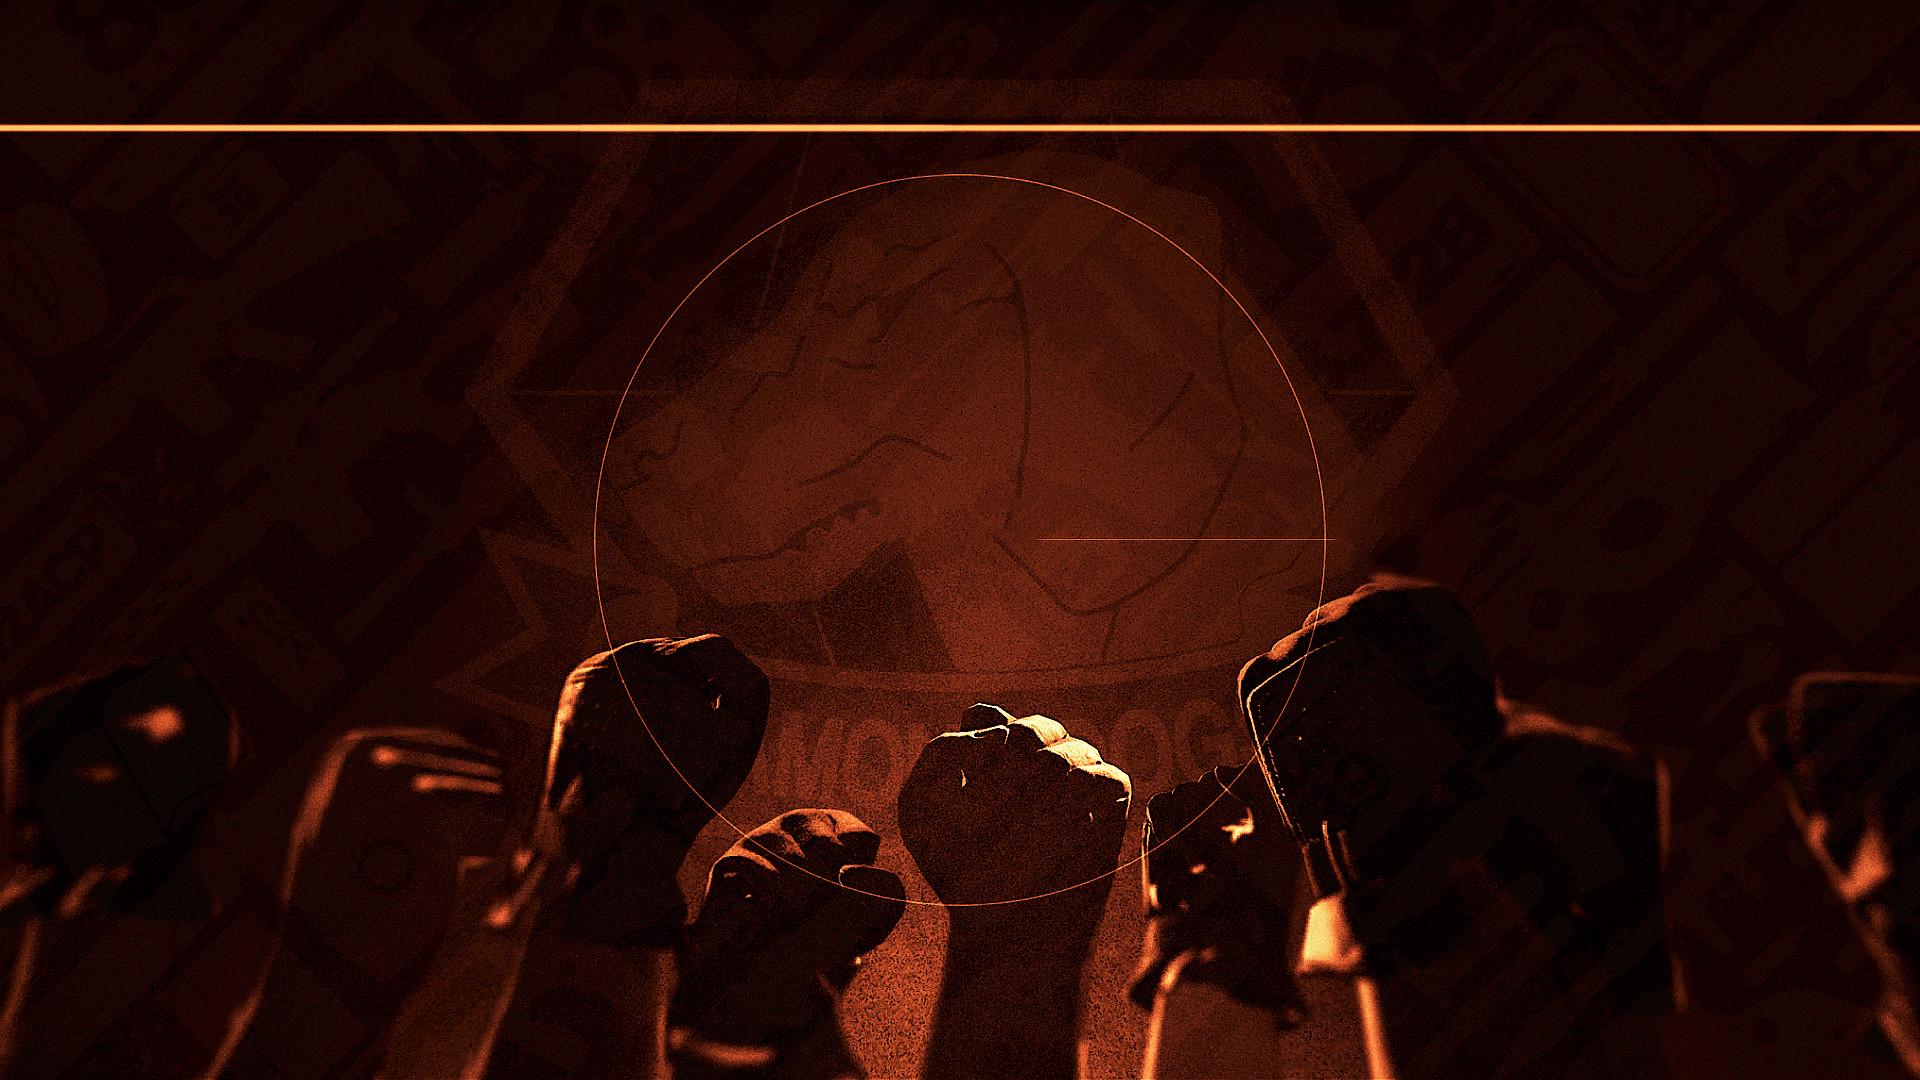 I made a diamond dogs wallpaper #MetalGearSolid #mgs #MGSV #MetalGear  #Konami